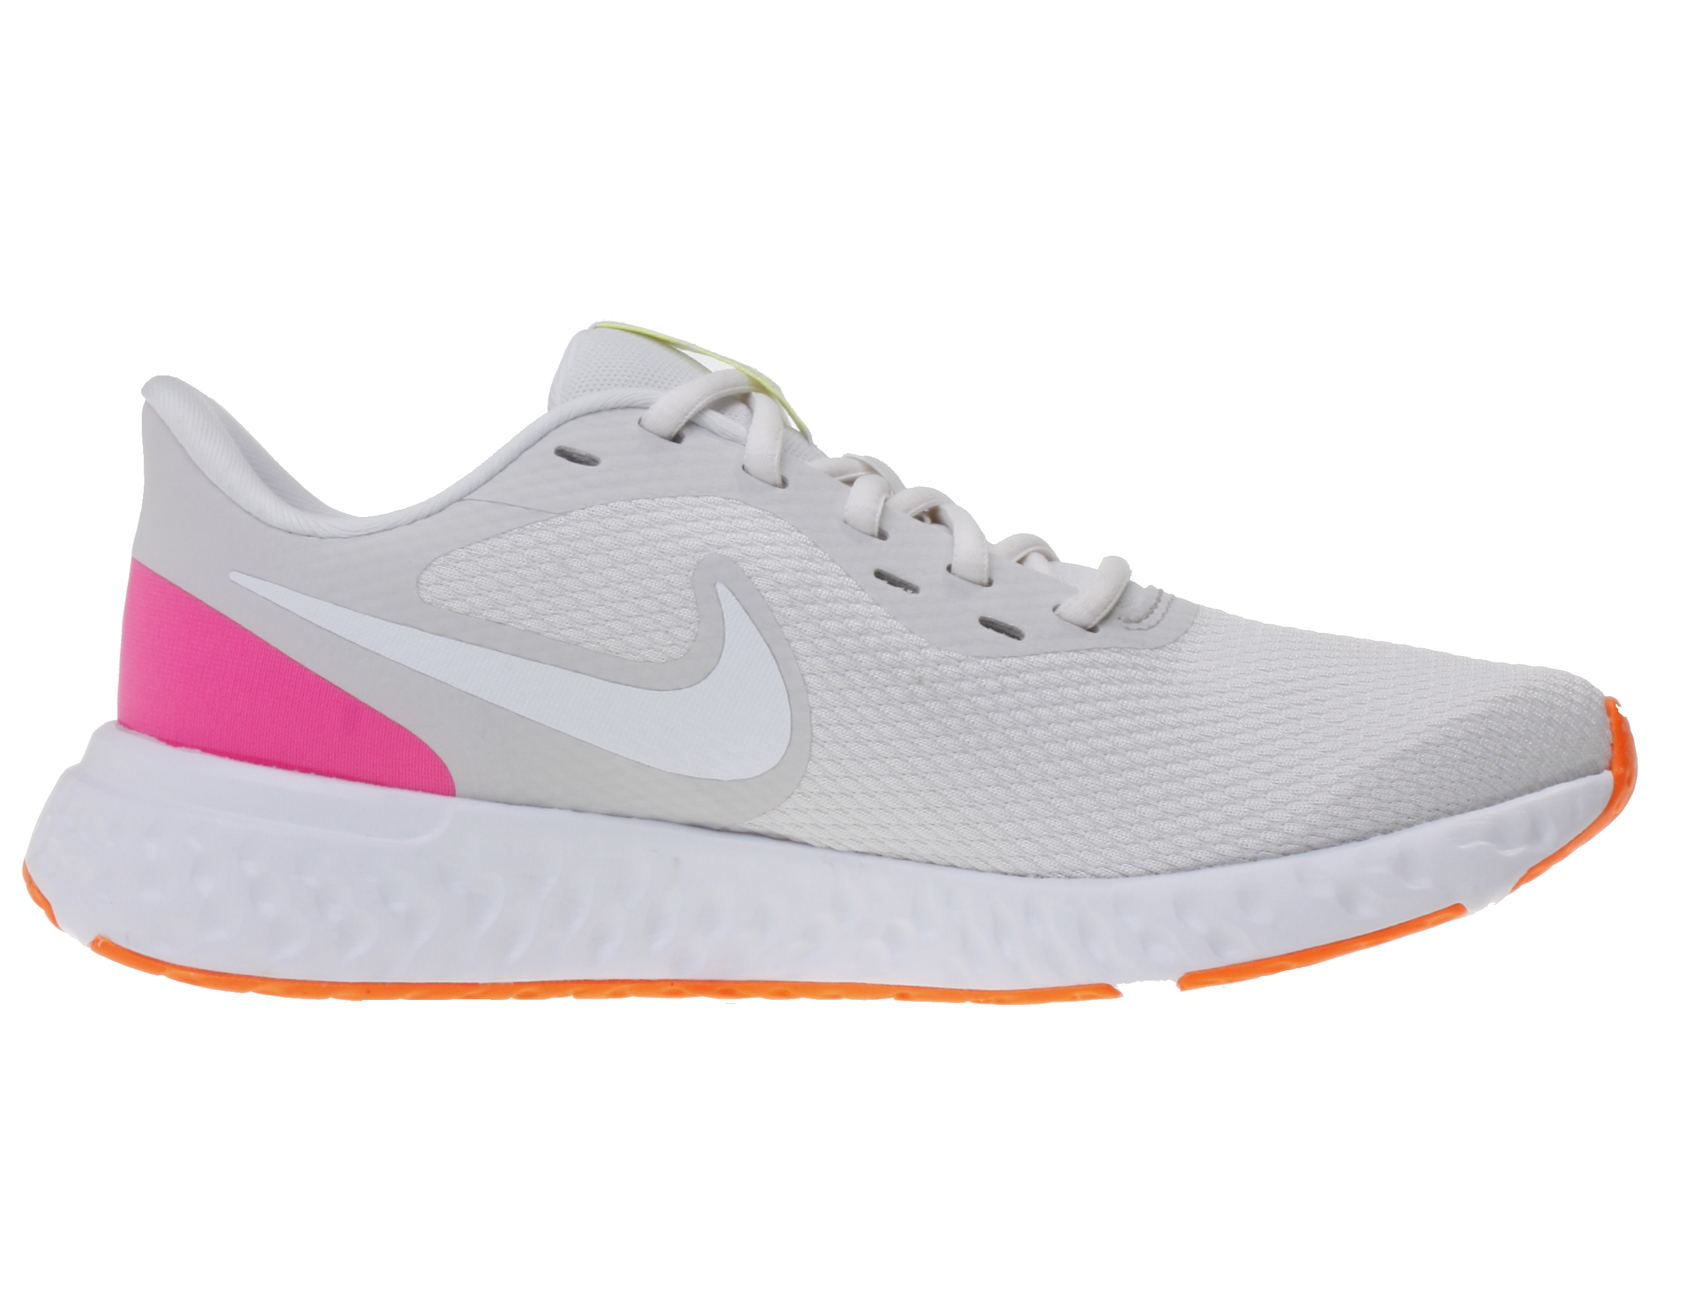 Details zu Nike Damen Sneaker Schuhe Wmns Nike Revolution 5 weiss Training Yoga Fitness